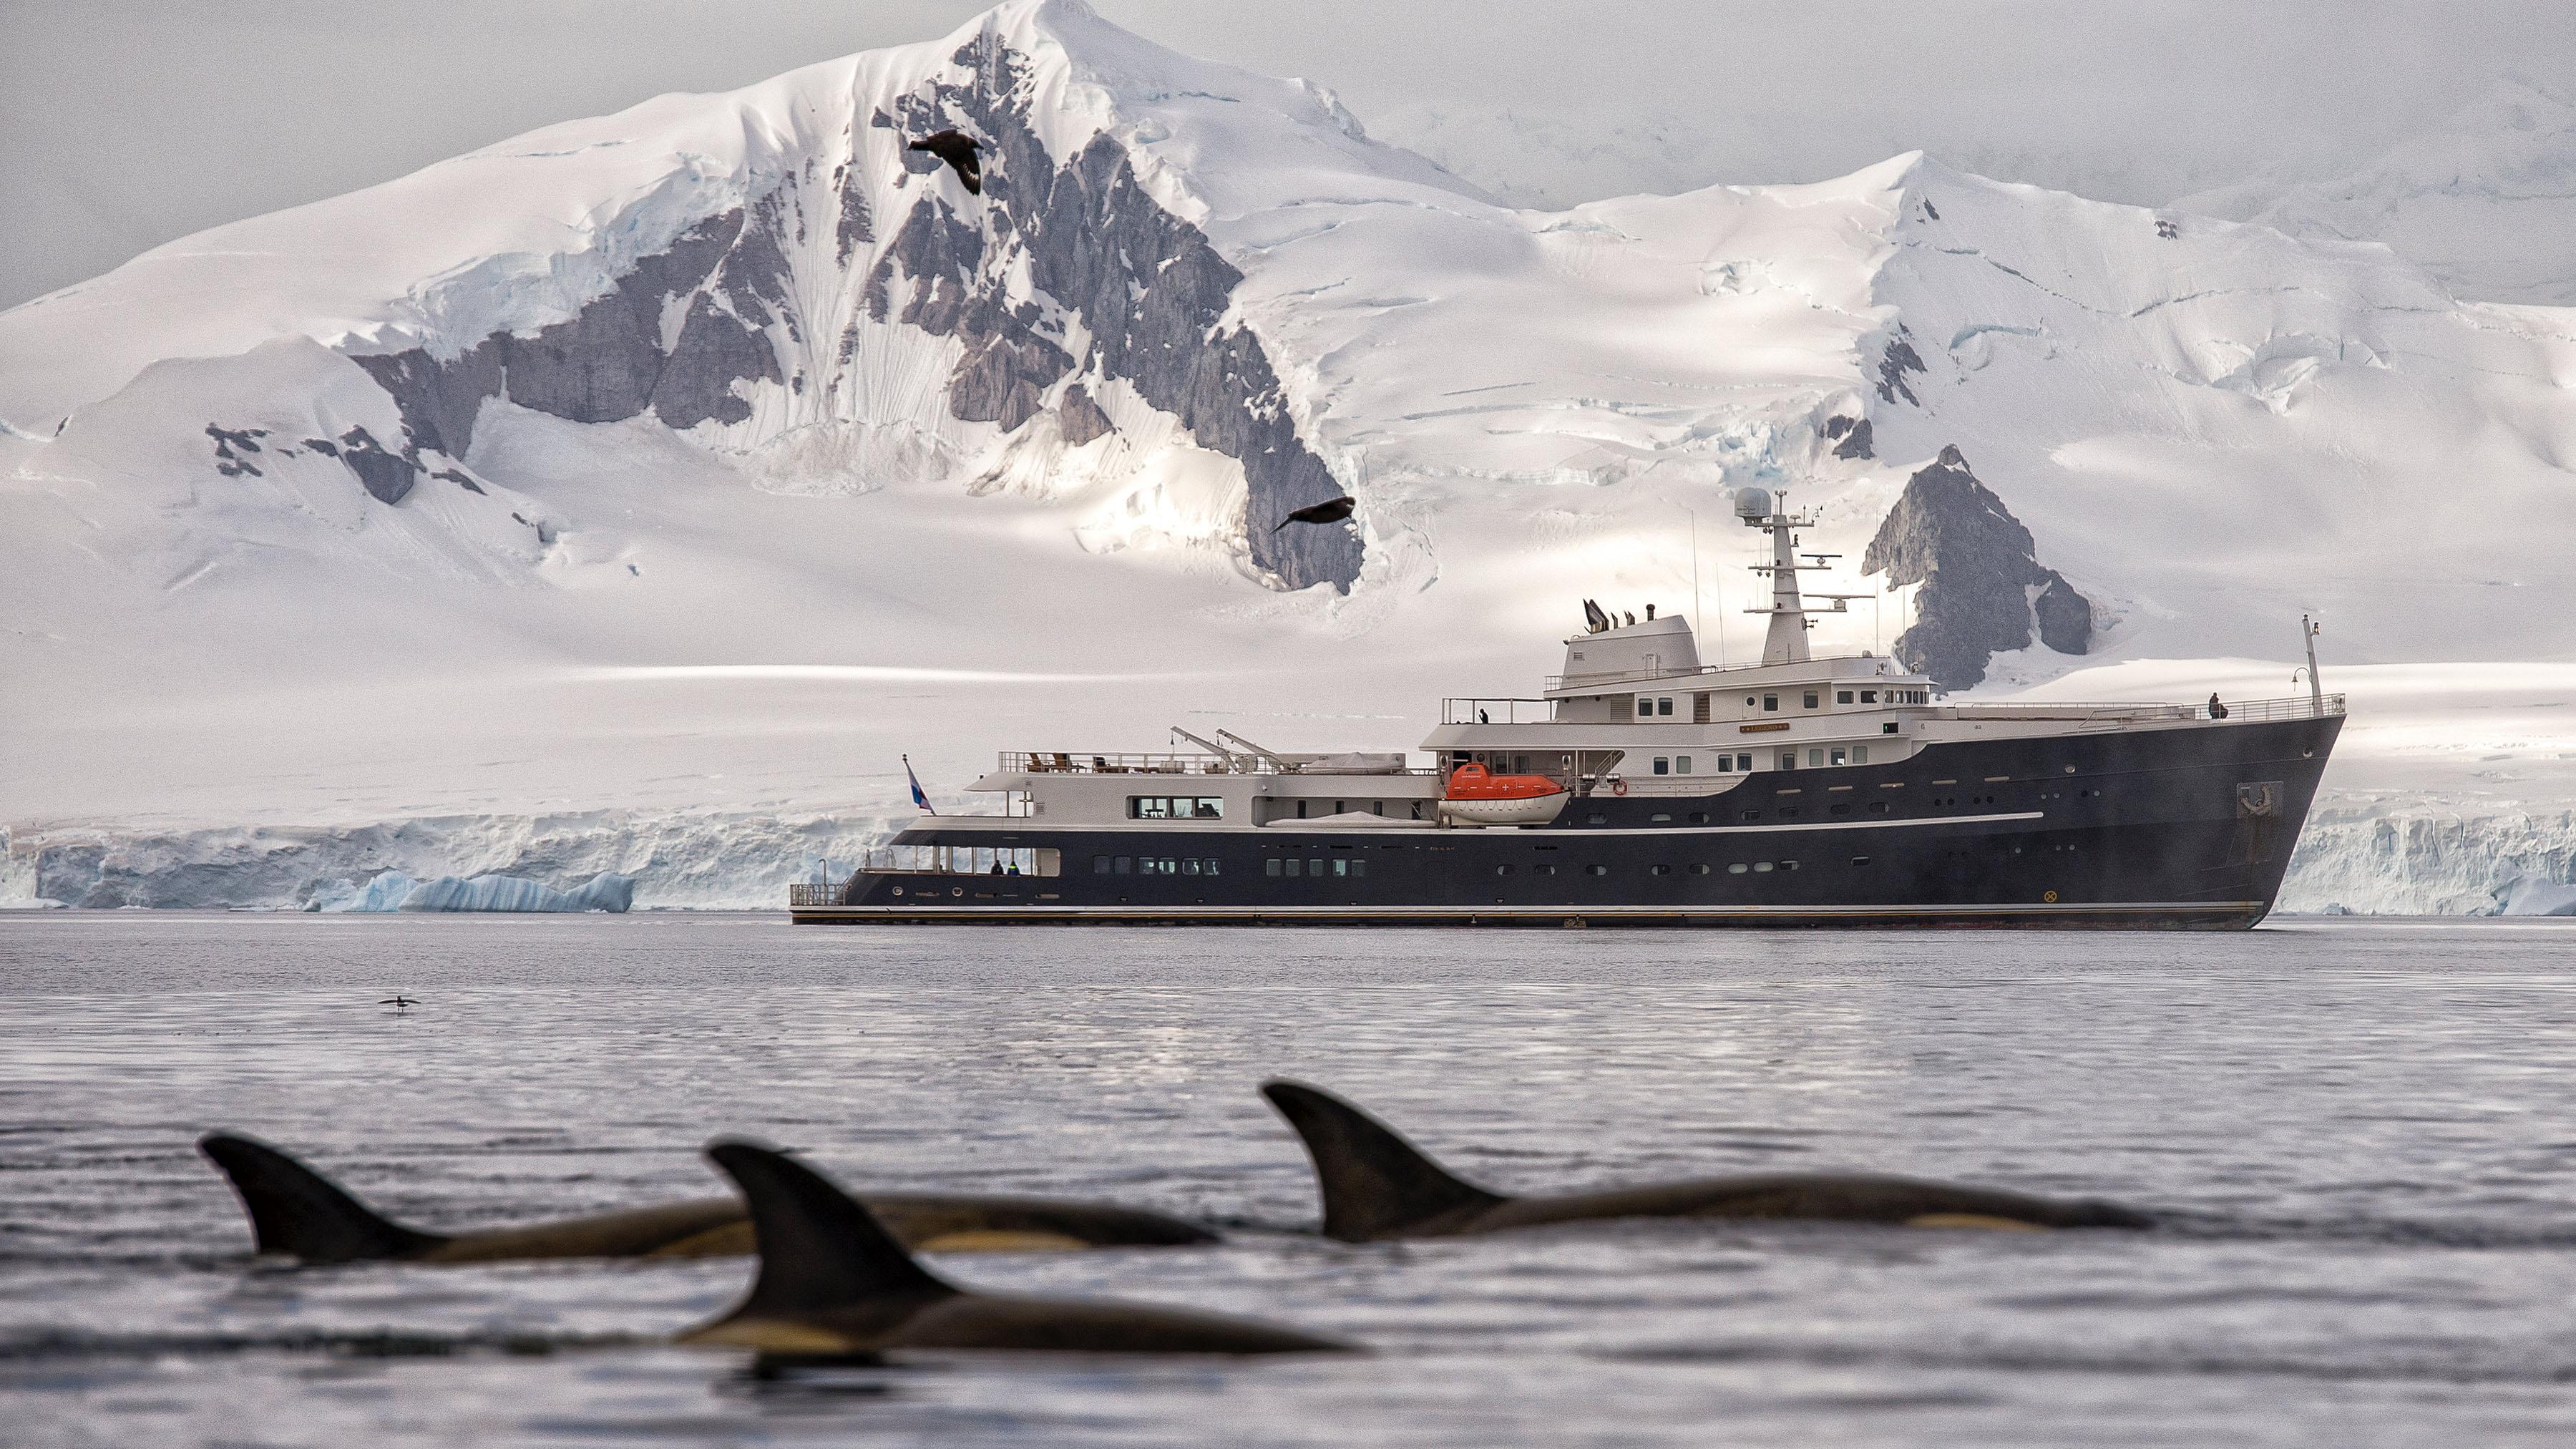 Legend Adventure yacht camper and nicholsons charter yacht MYBA